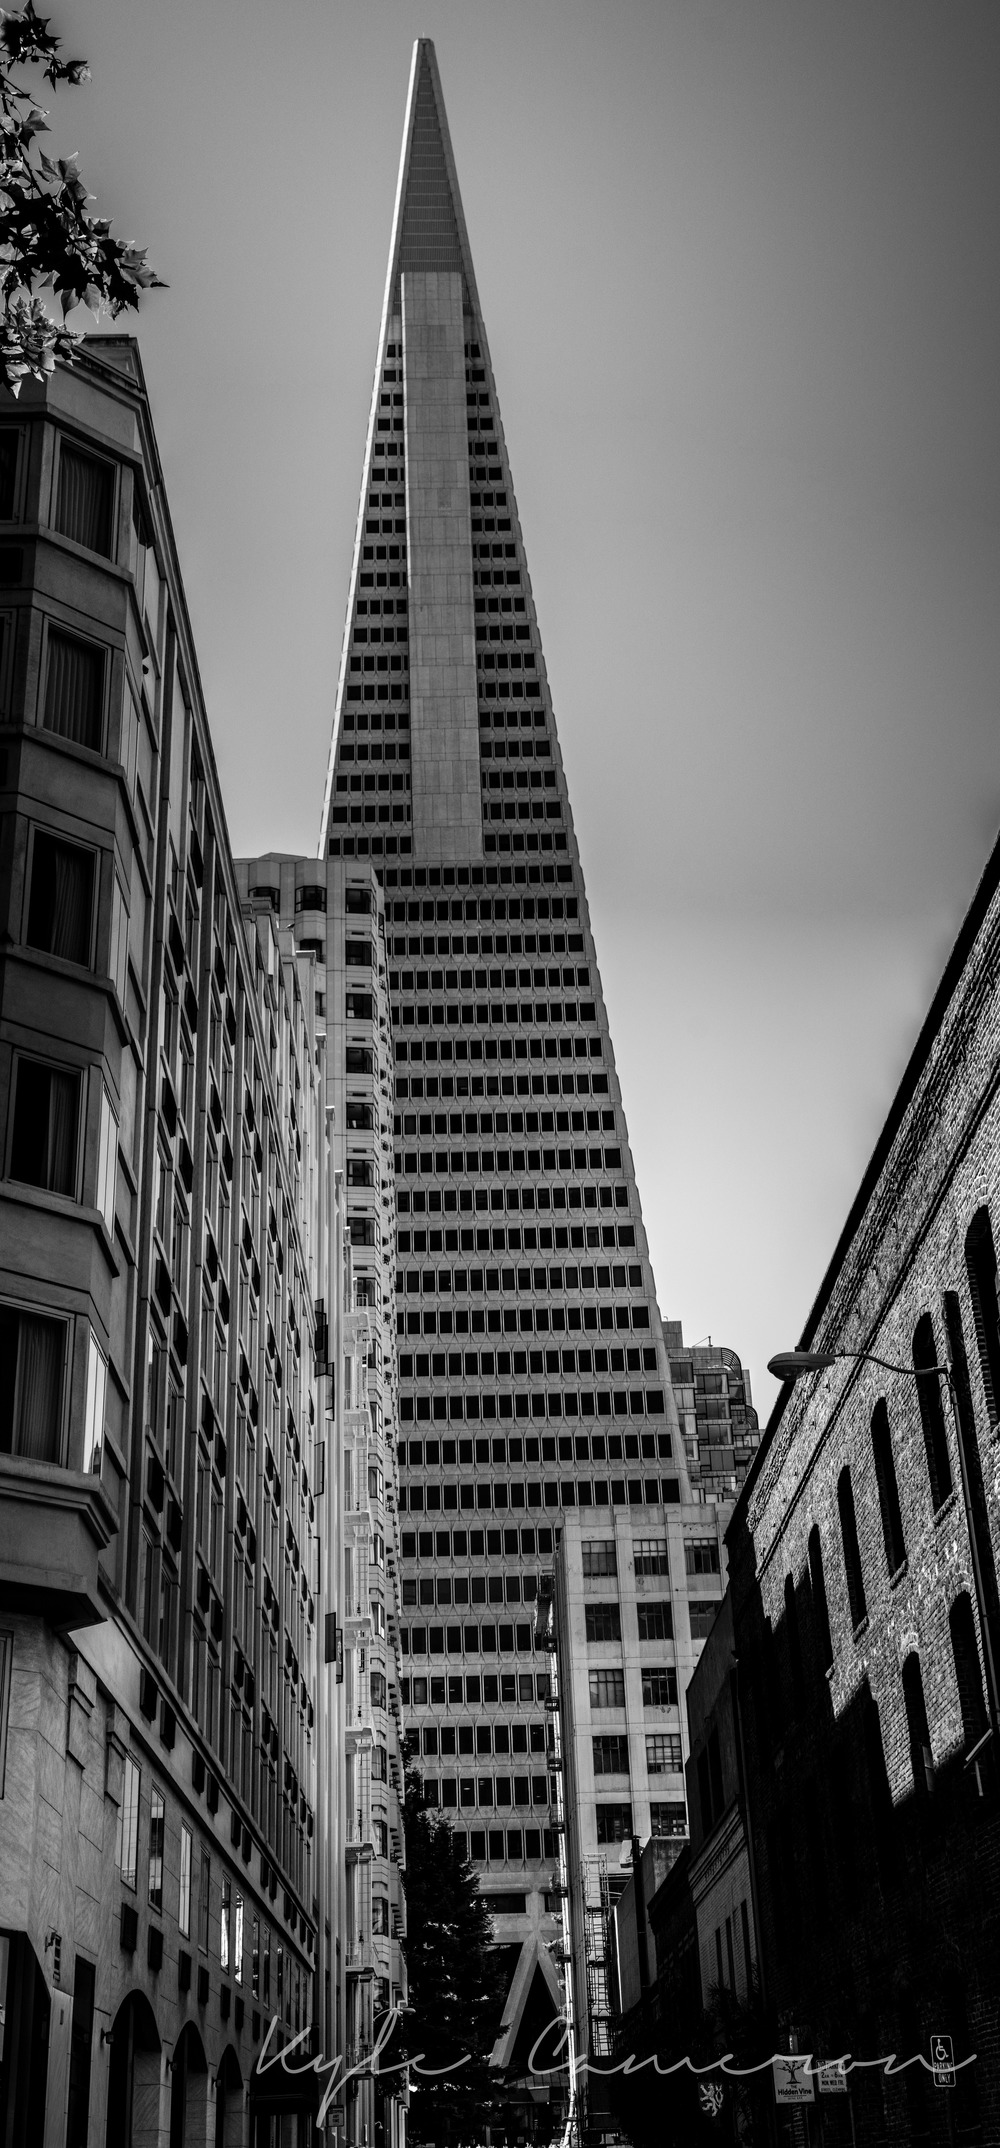 The Transamerica Pyramid